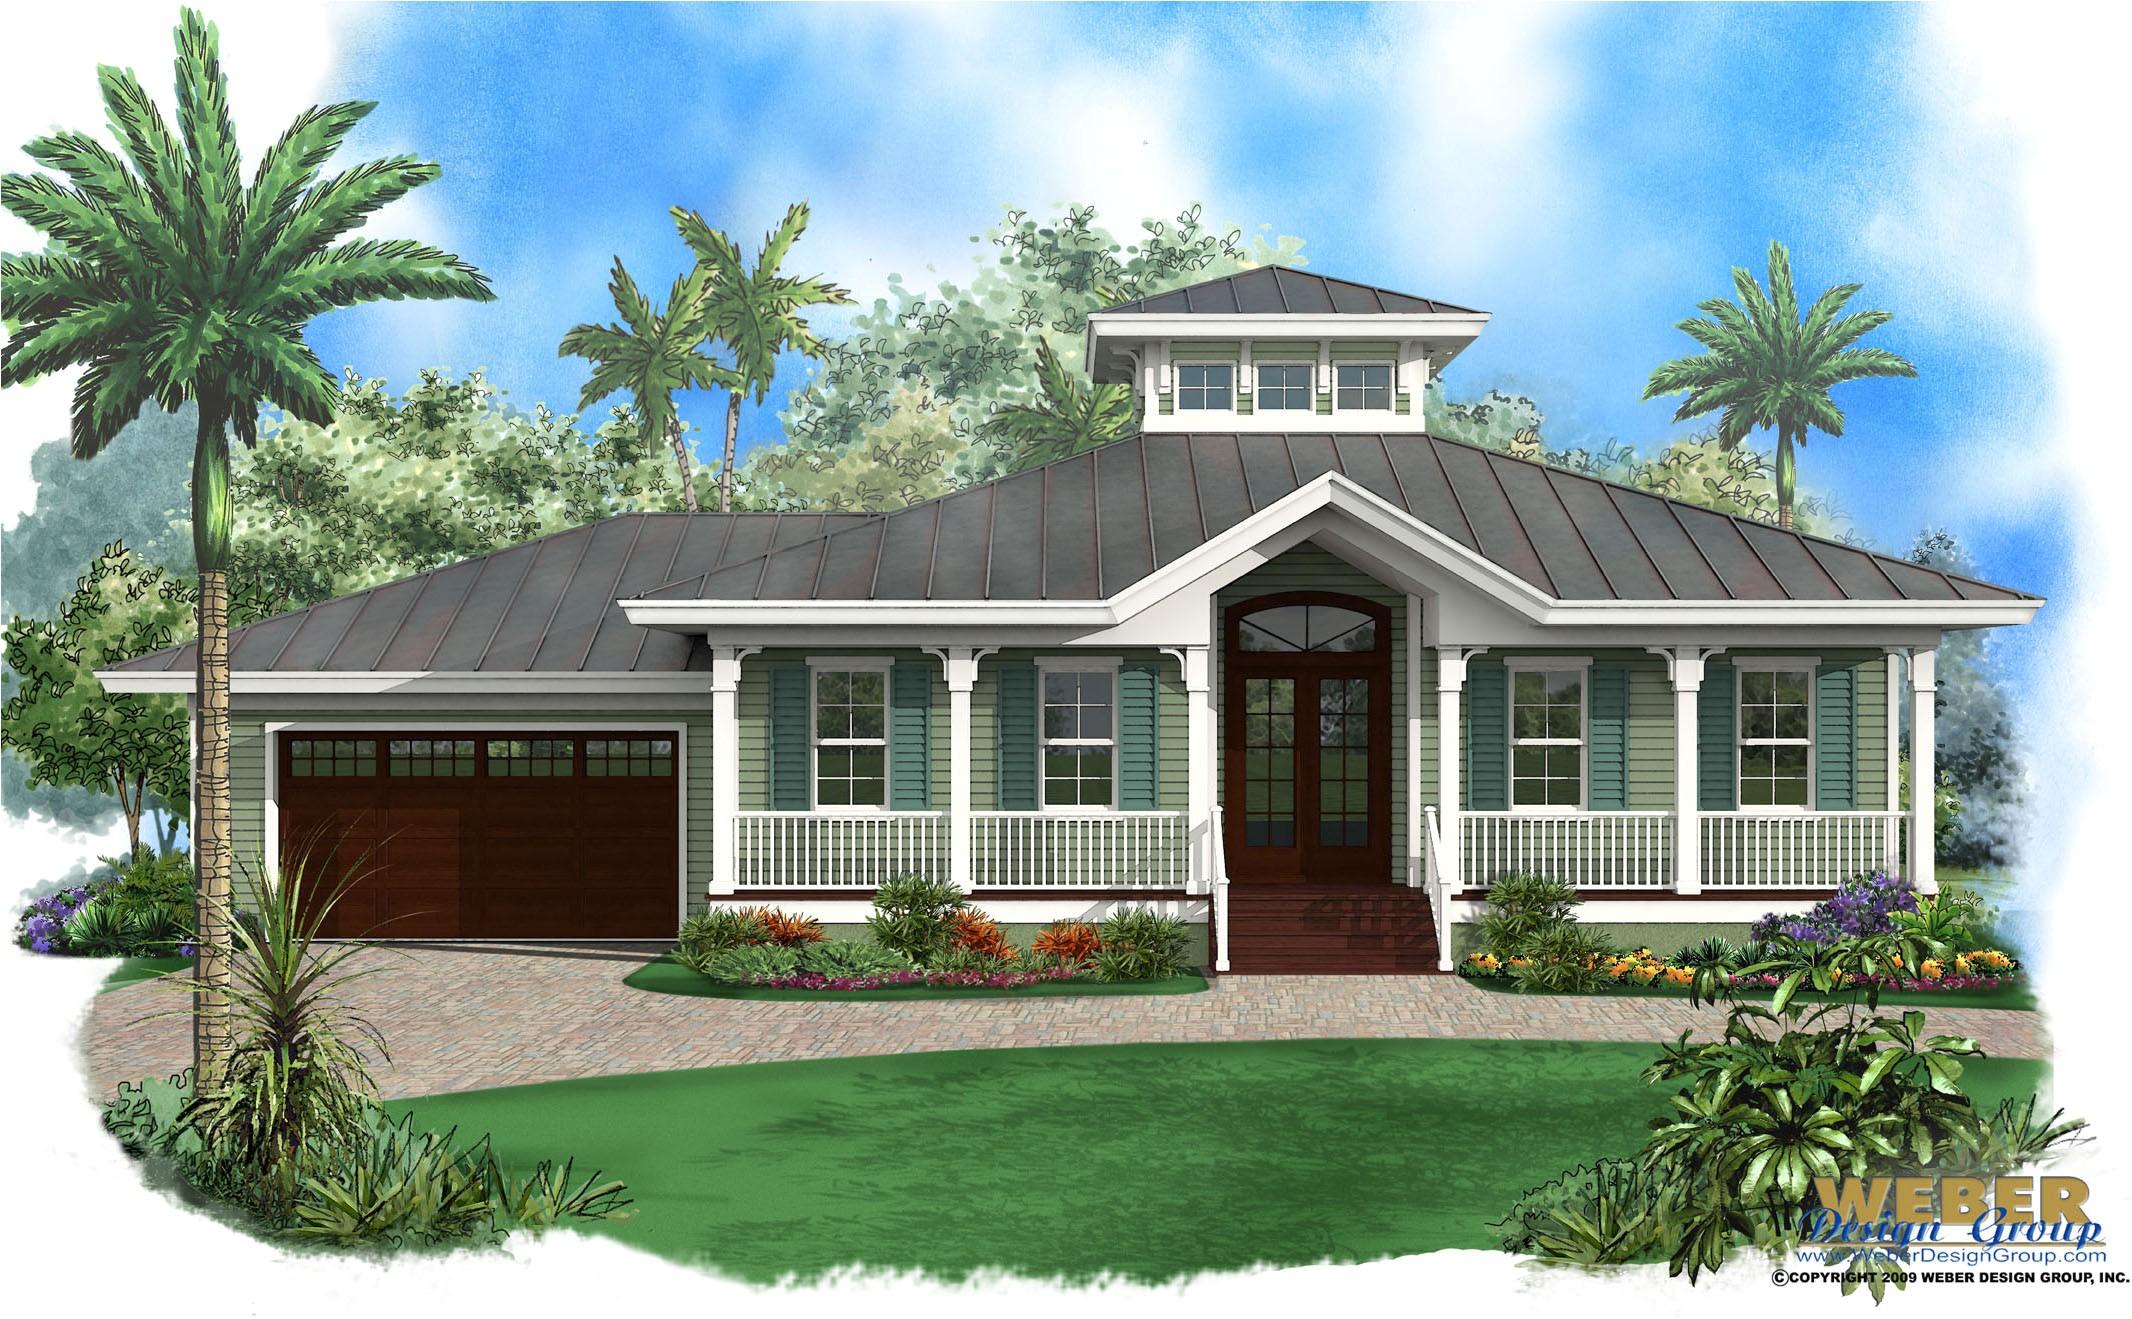 Florida Style Home Plans Key West House Plans Key West island Style Home Floor Plans